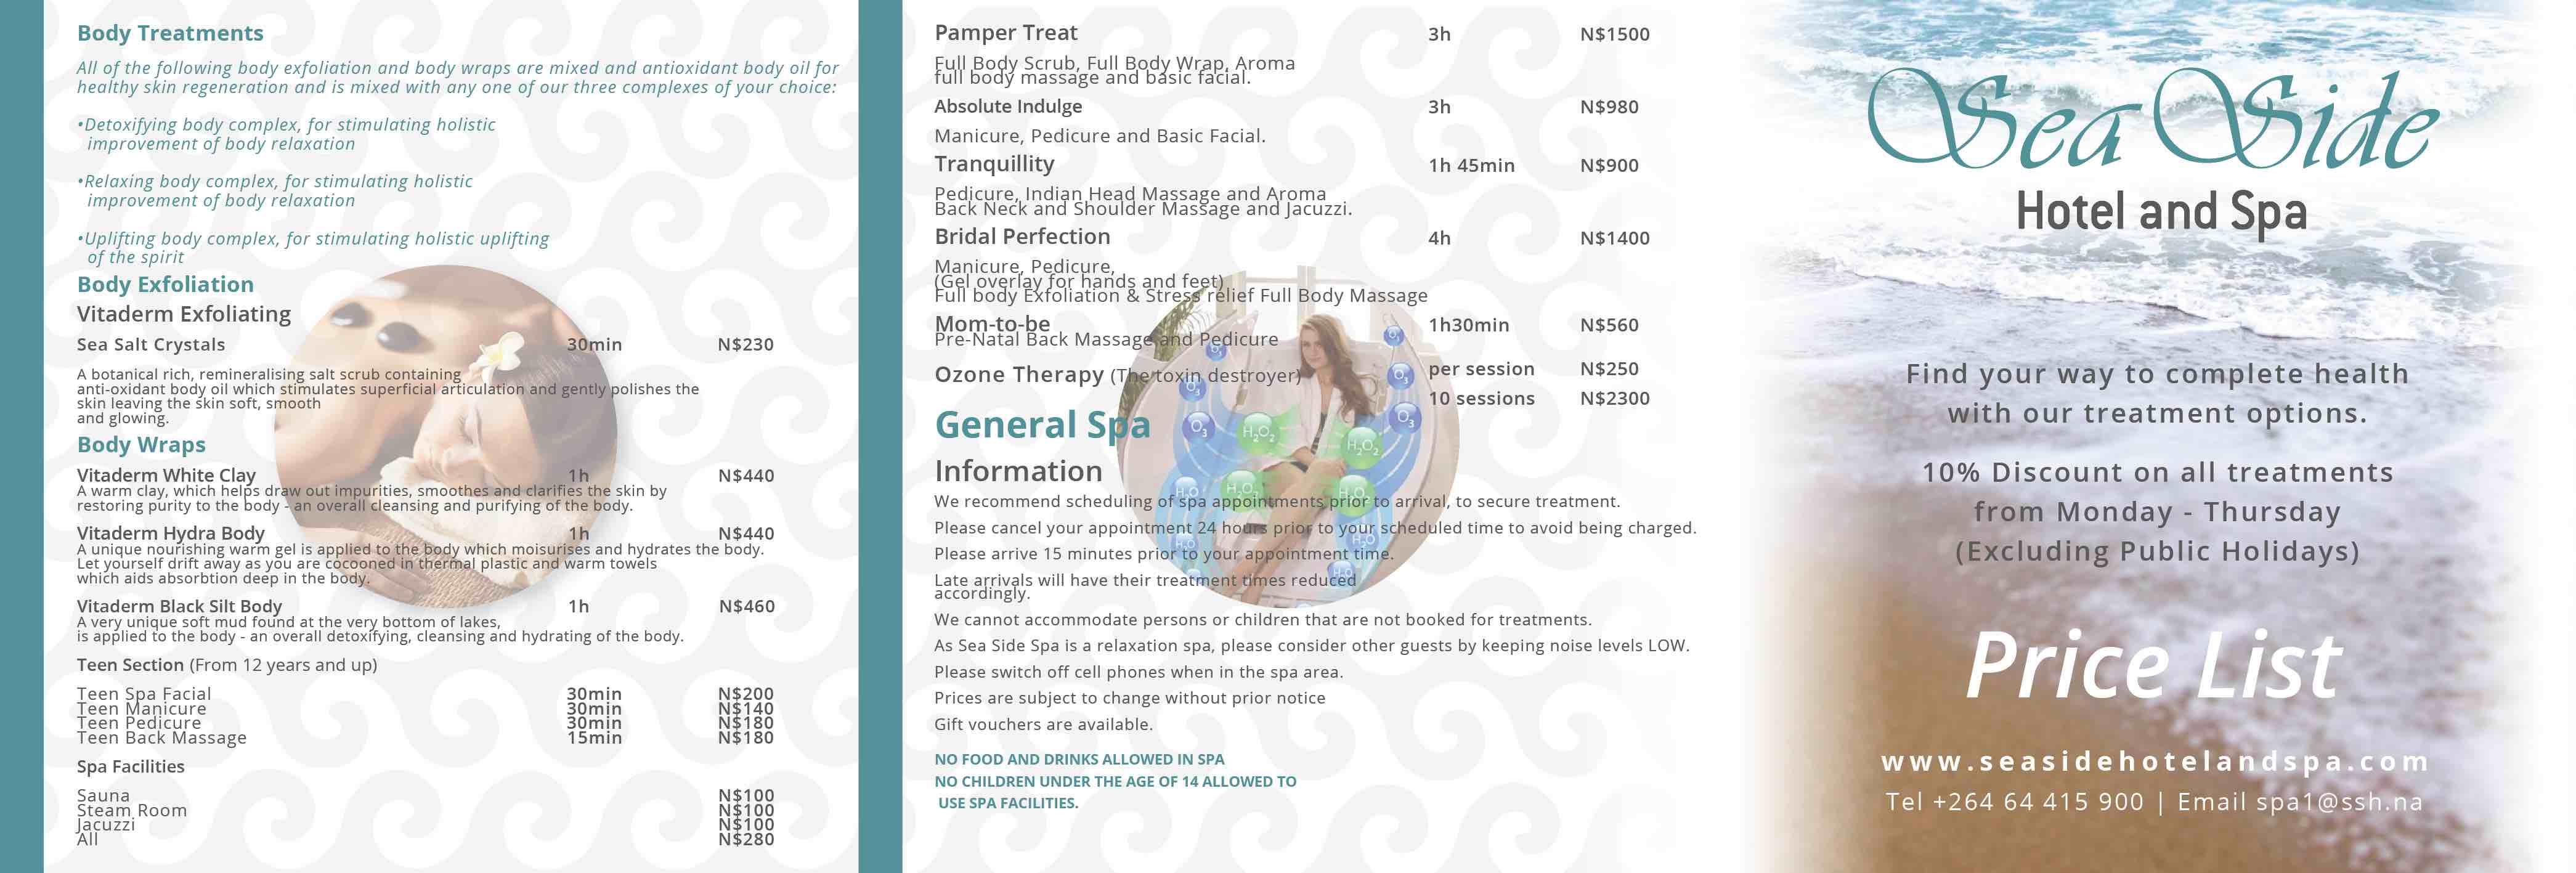 SeaSide_new brochure